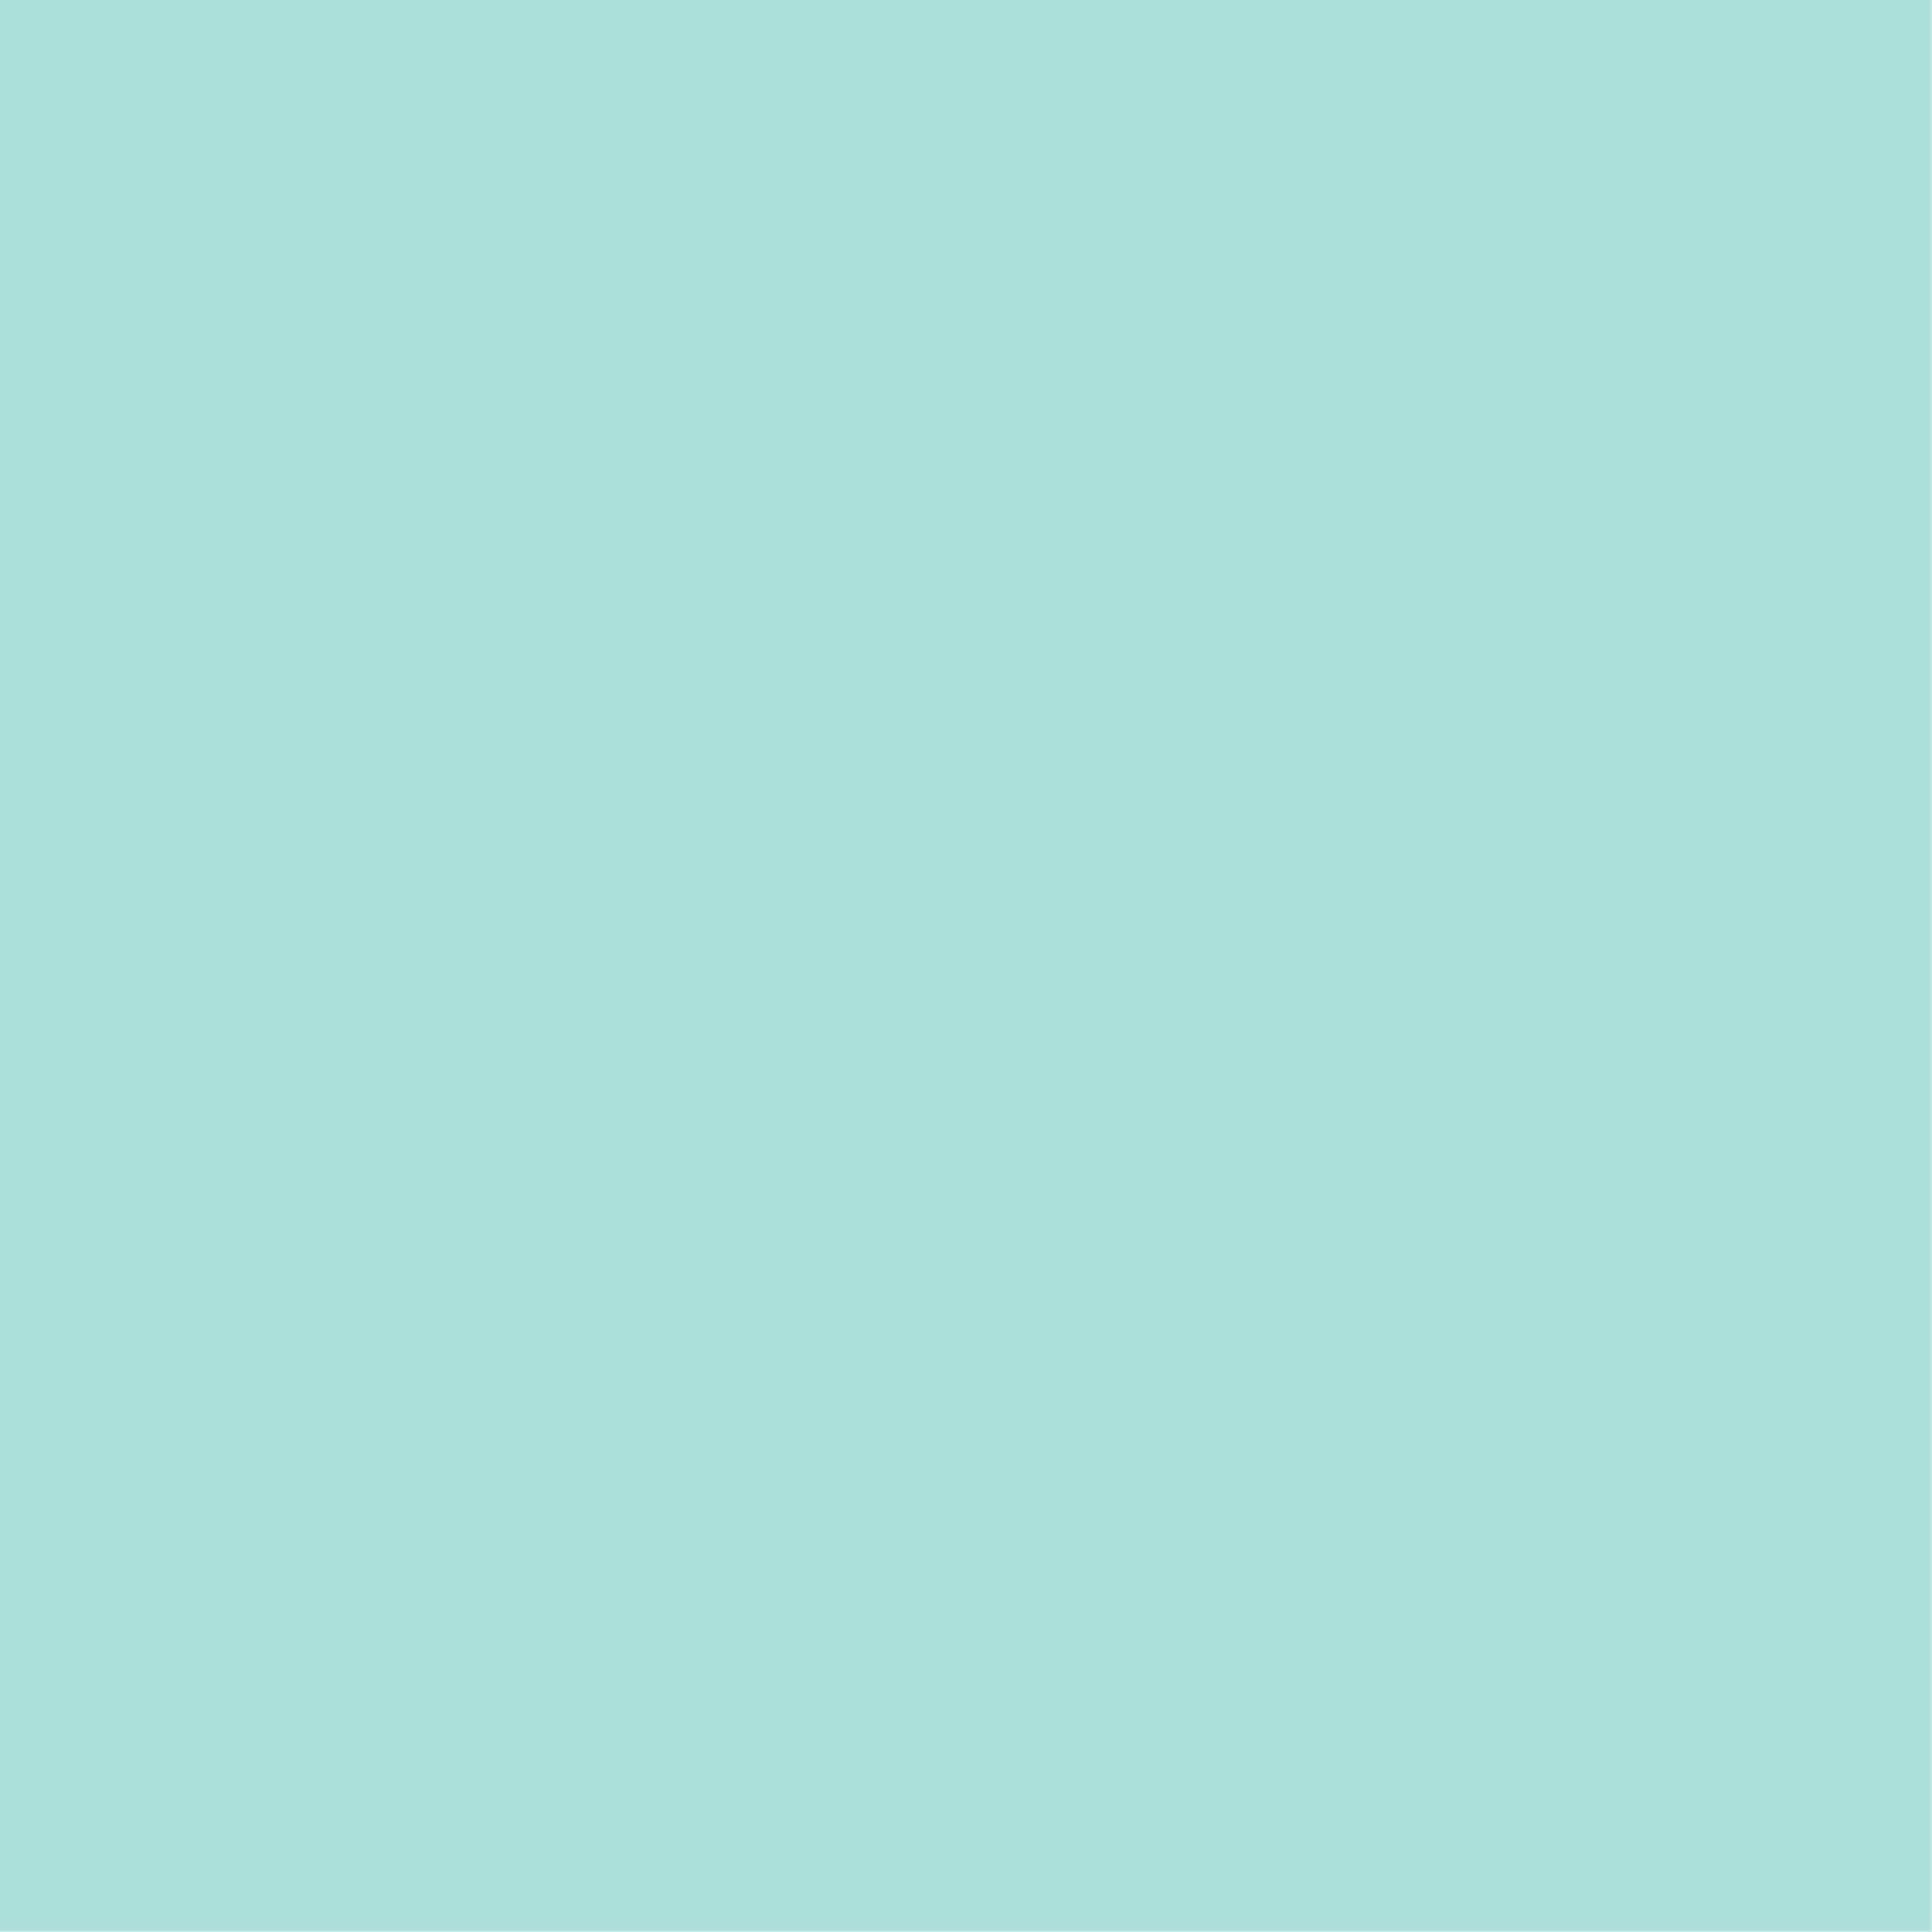 29. Pastel Blue